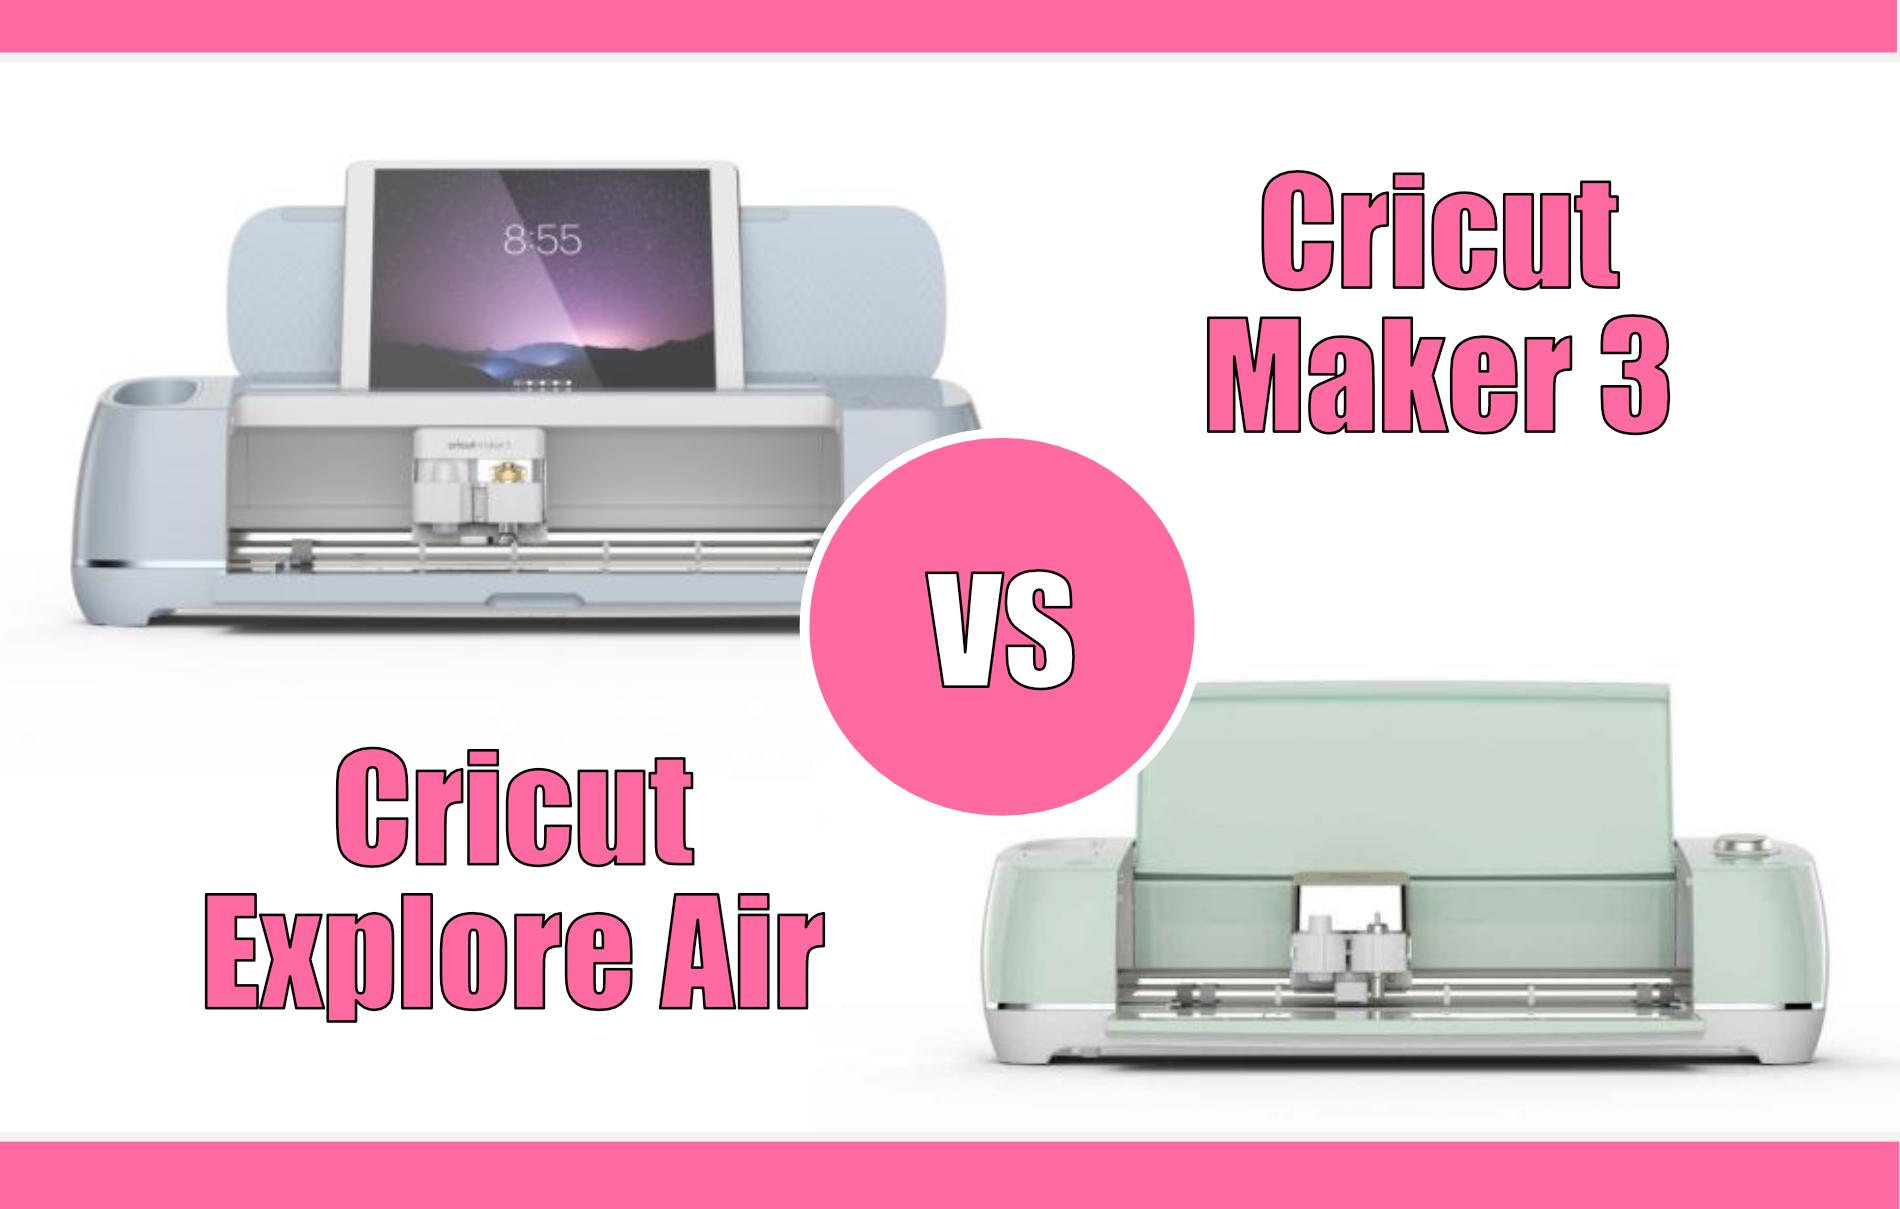 Differenza Cricut Maker 3 Cricut Explore Air